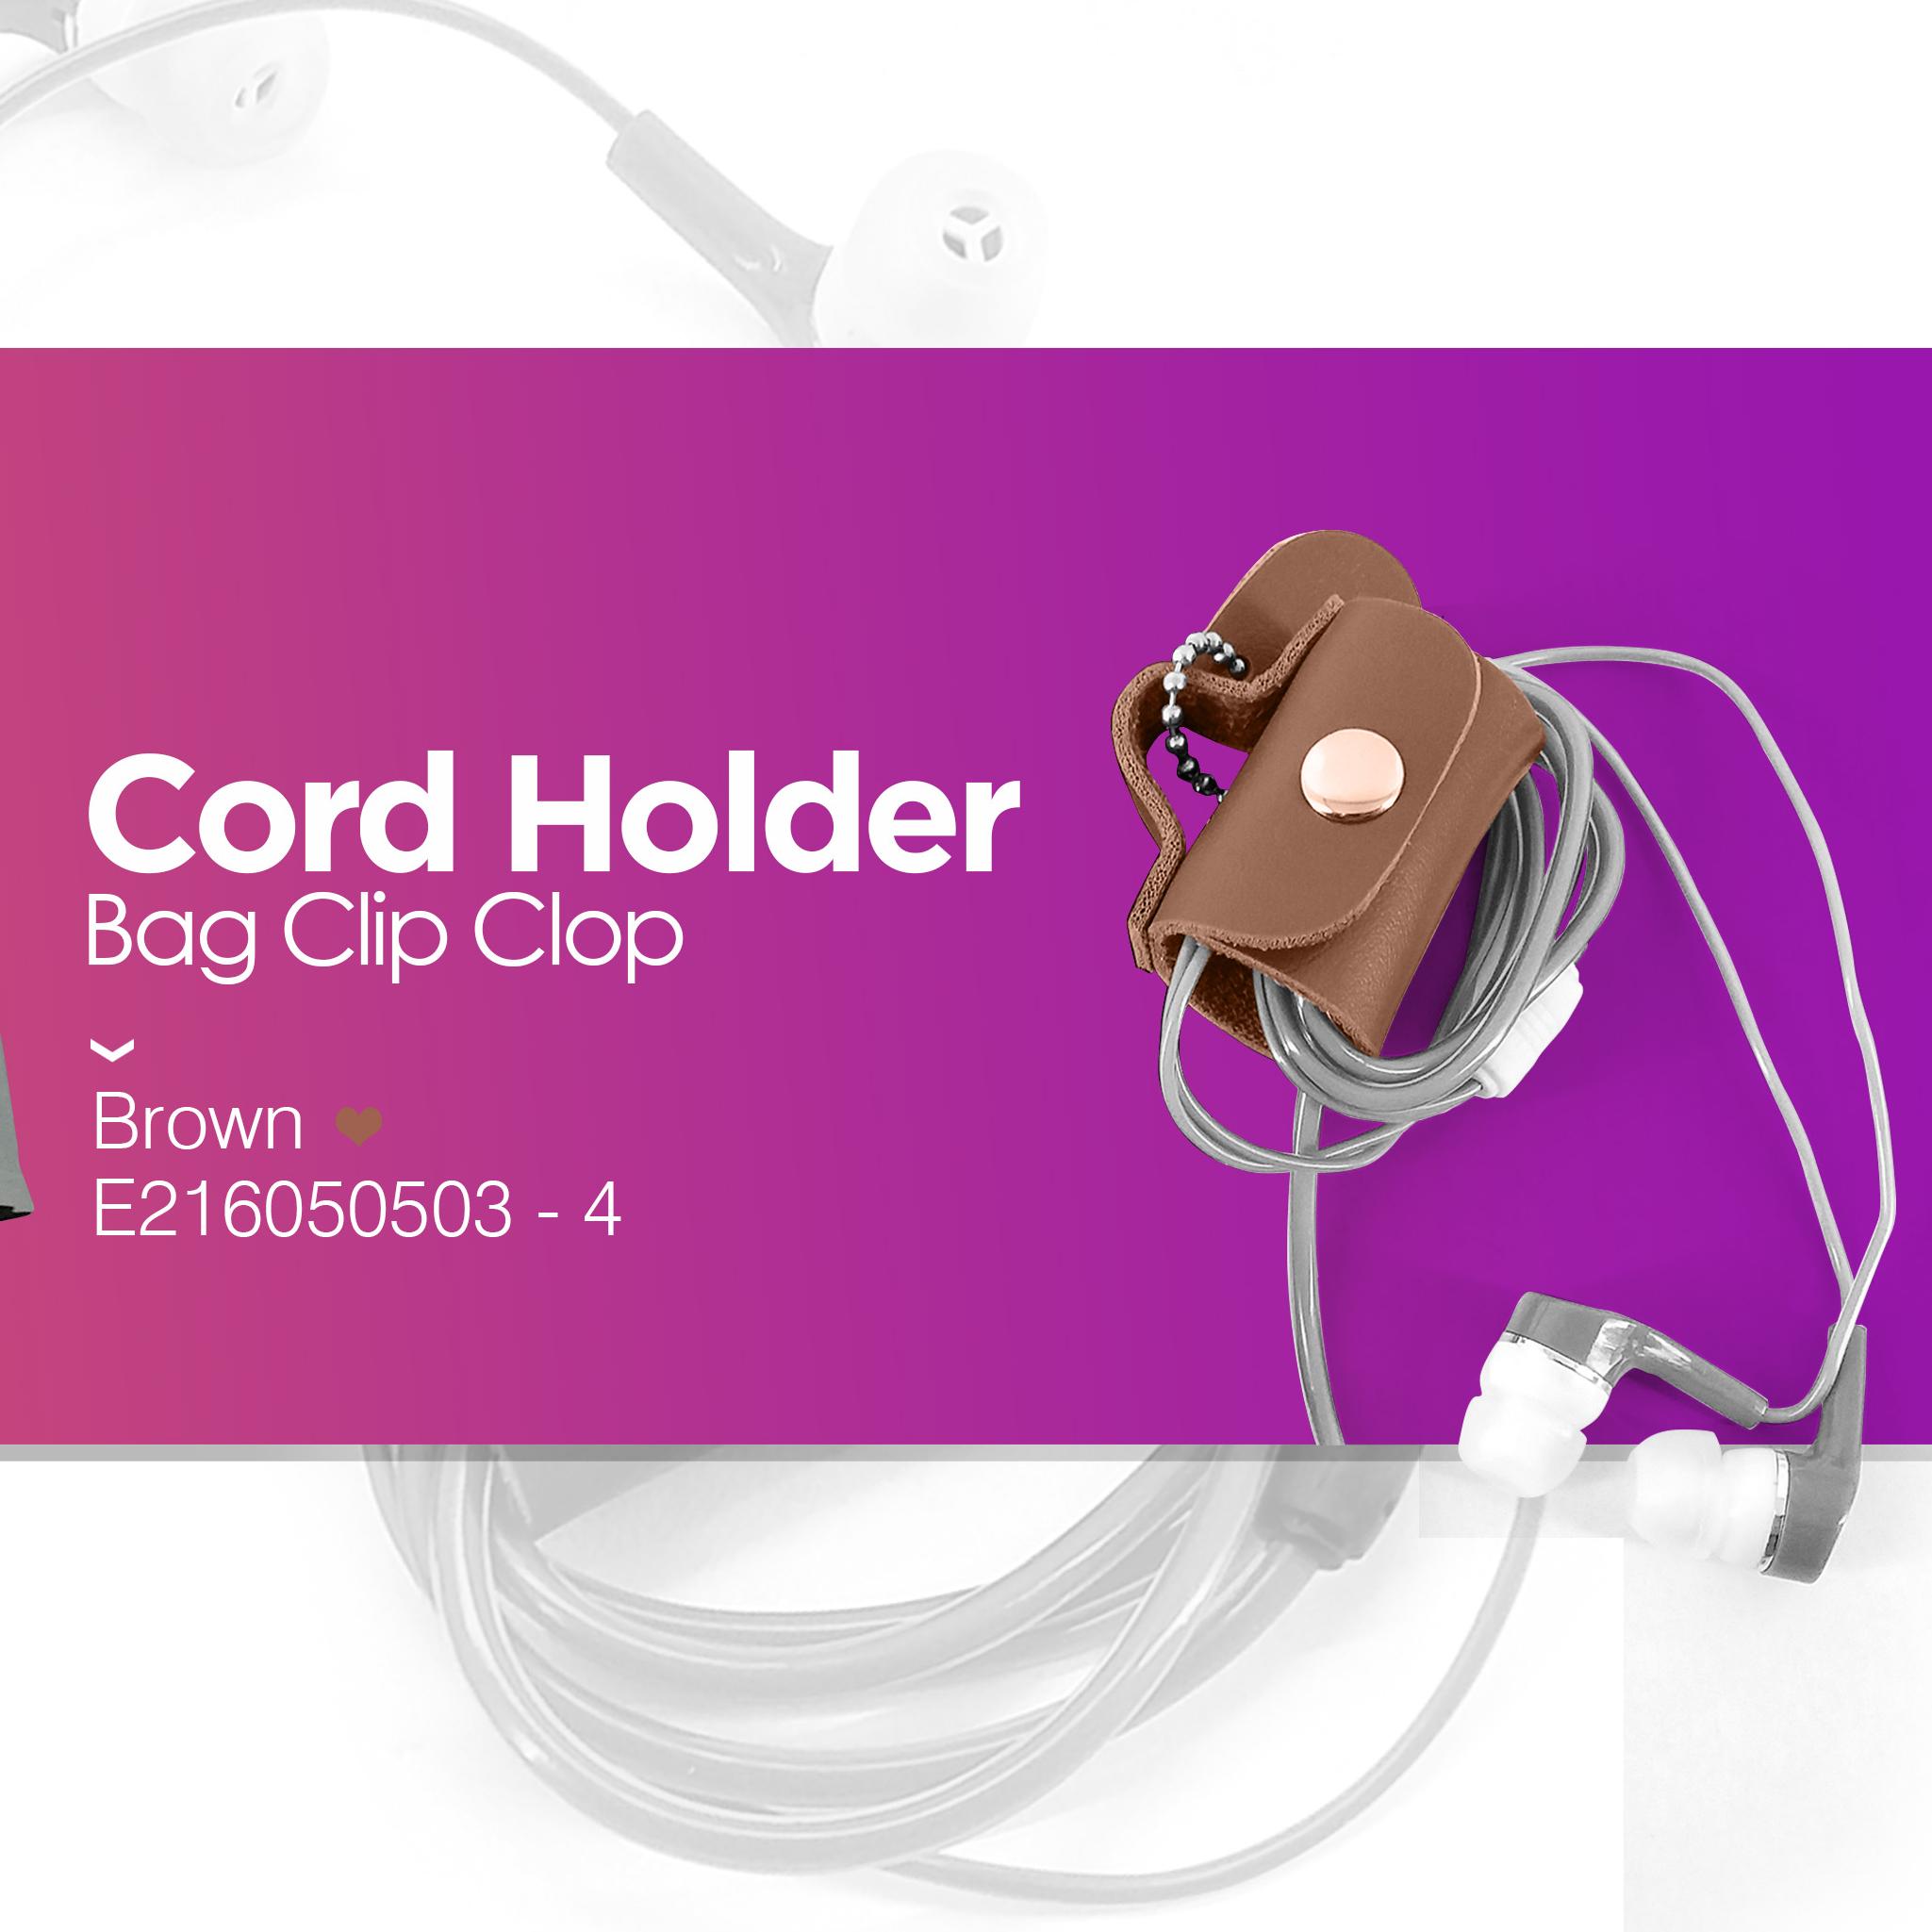 Cord Holder Bag Brown